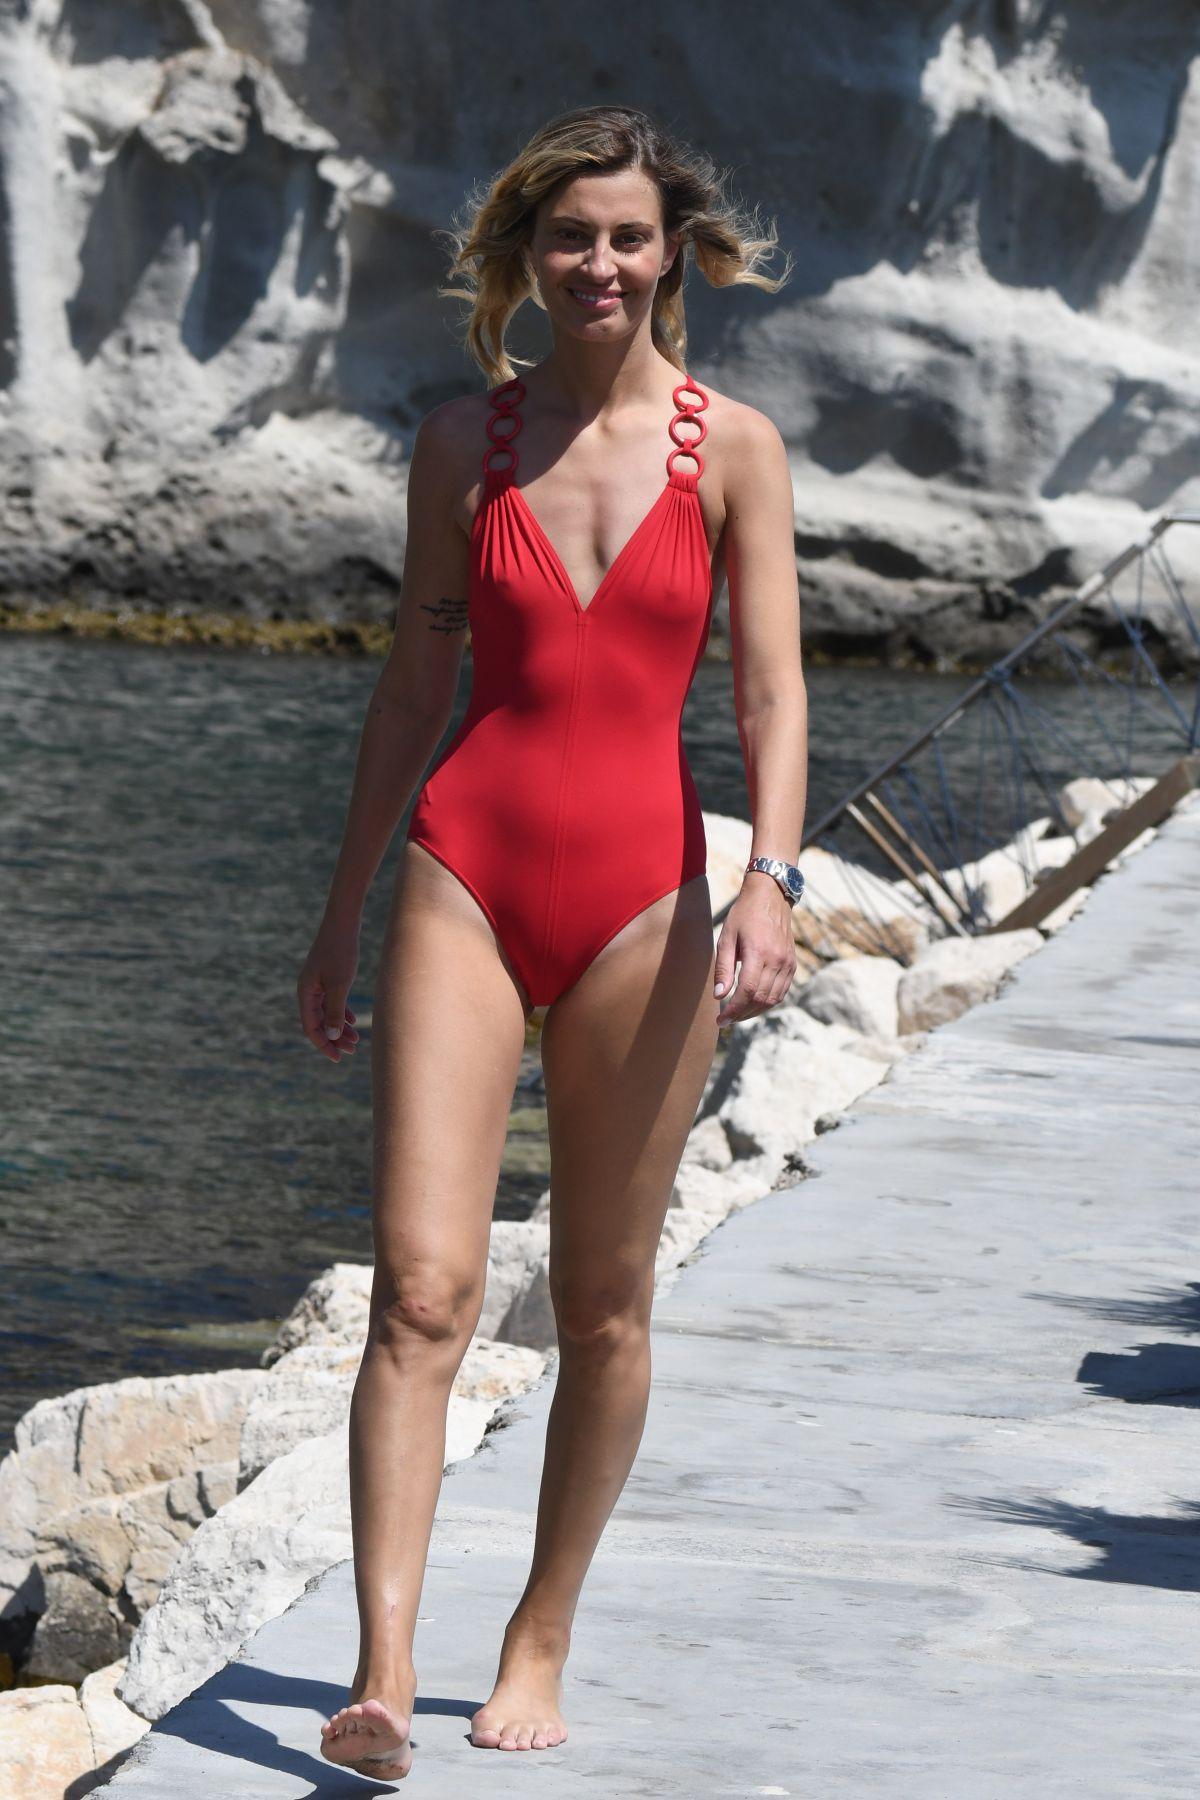 Selfie Alexandra Zimny naked (95 foto and video), Sexy, Paparazzi, Feet, panties 2006